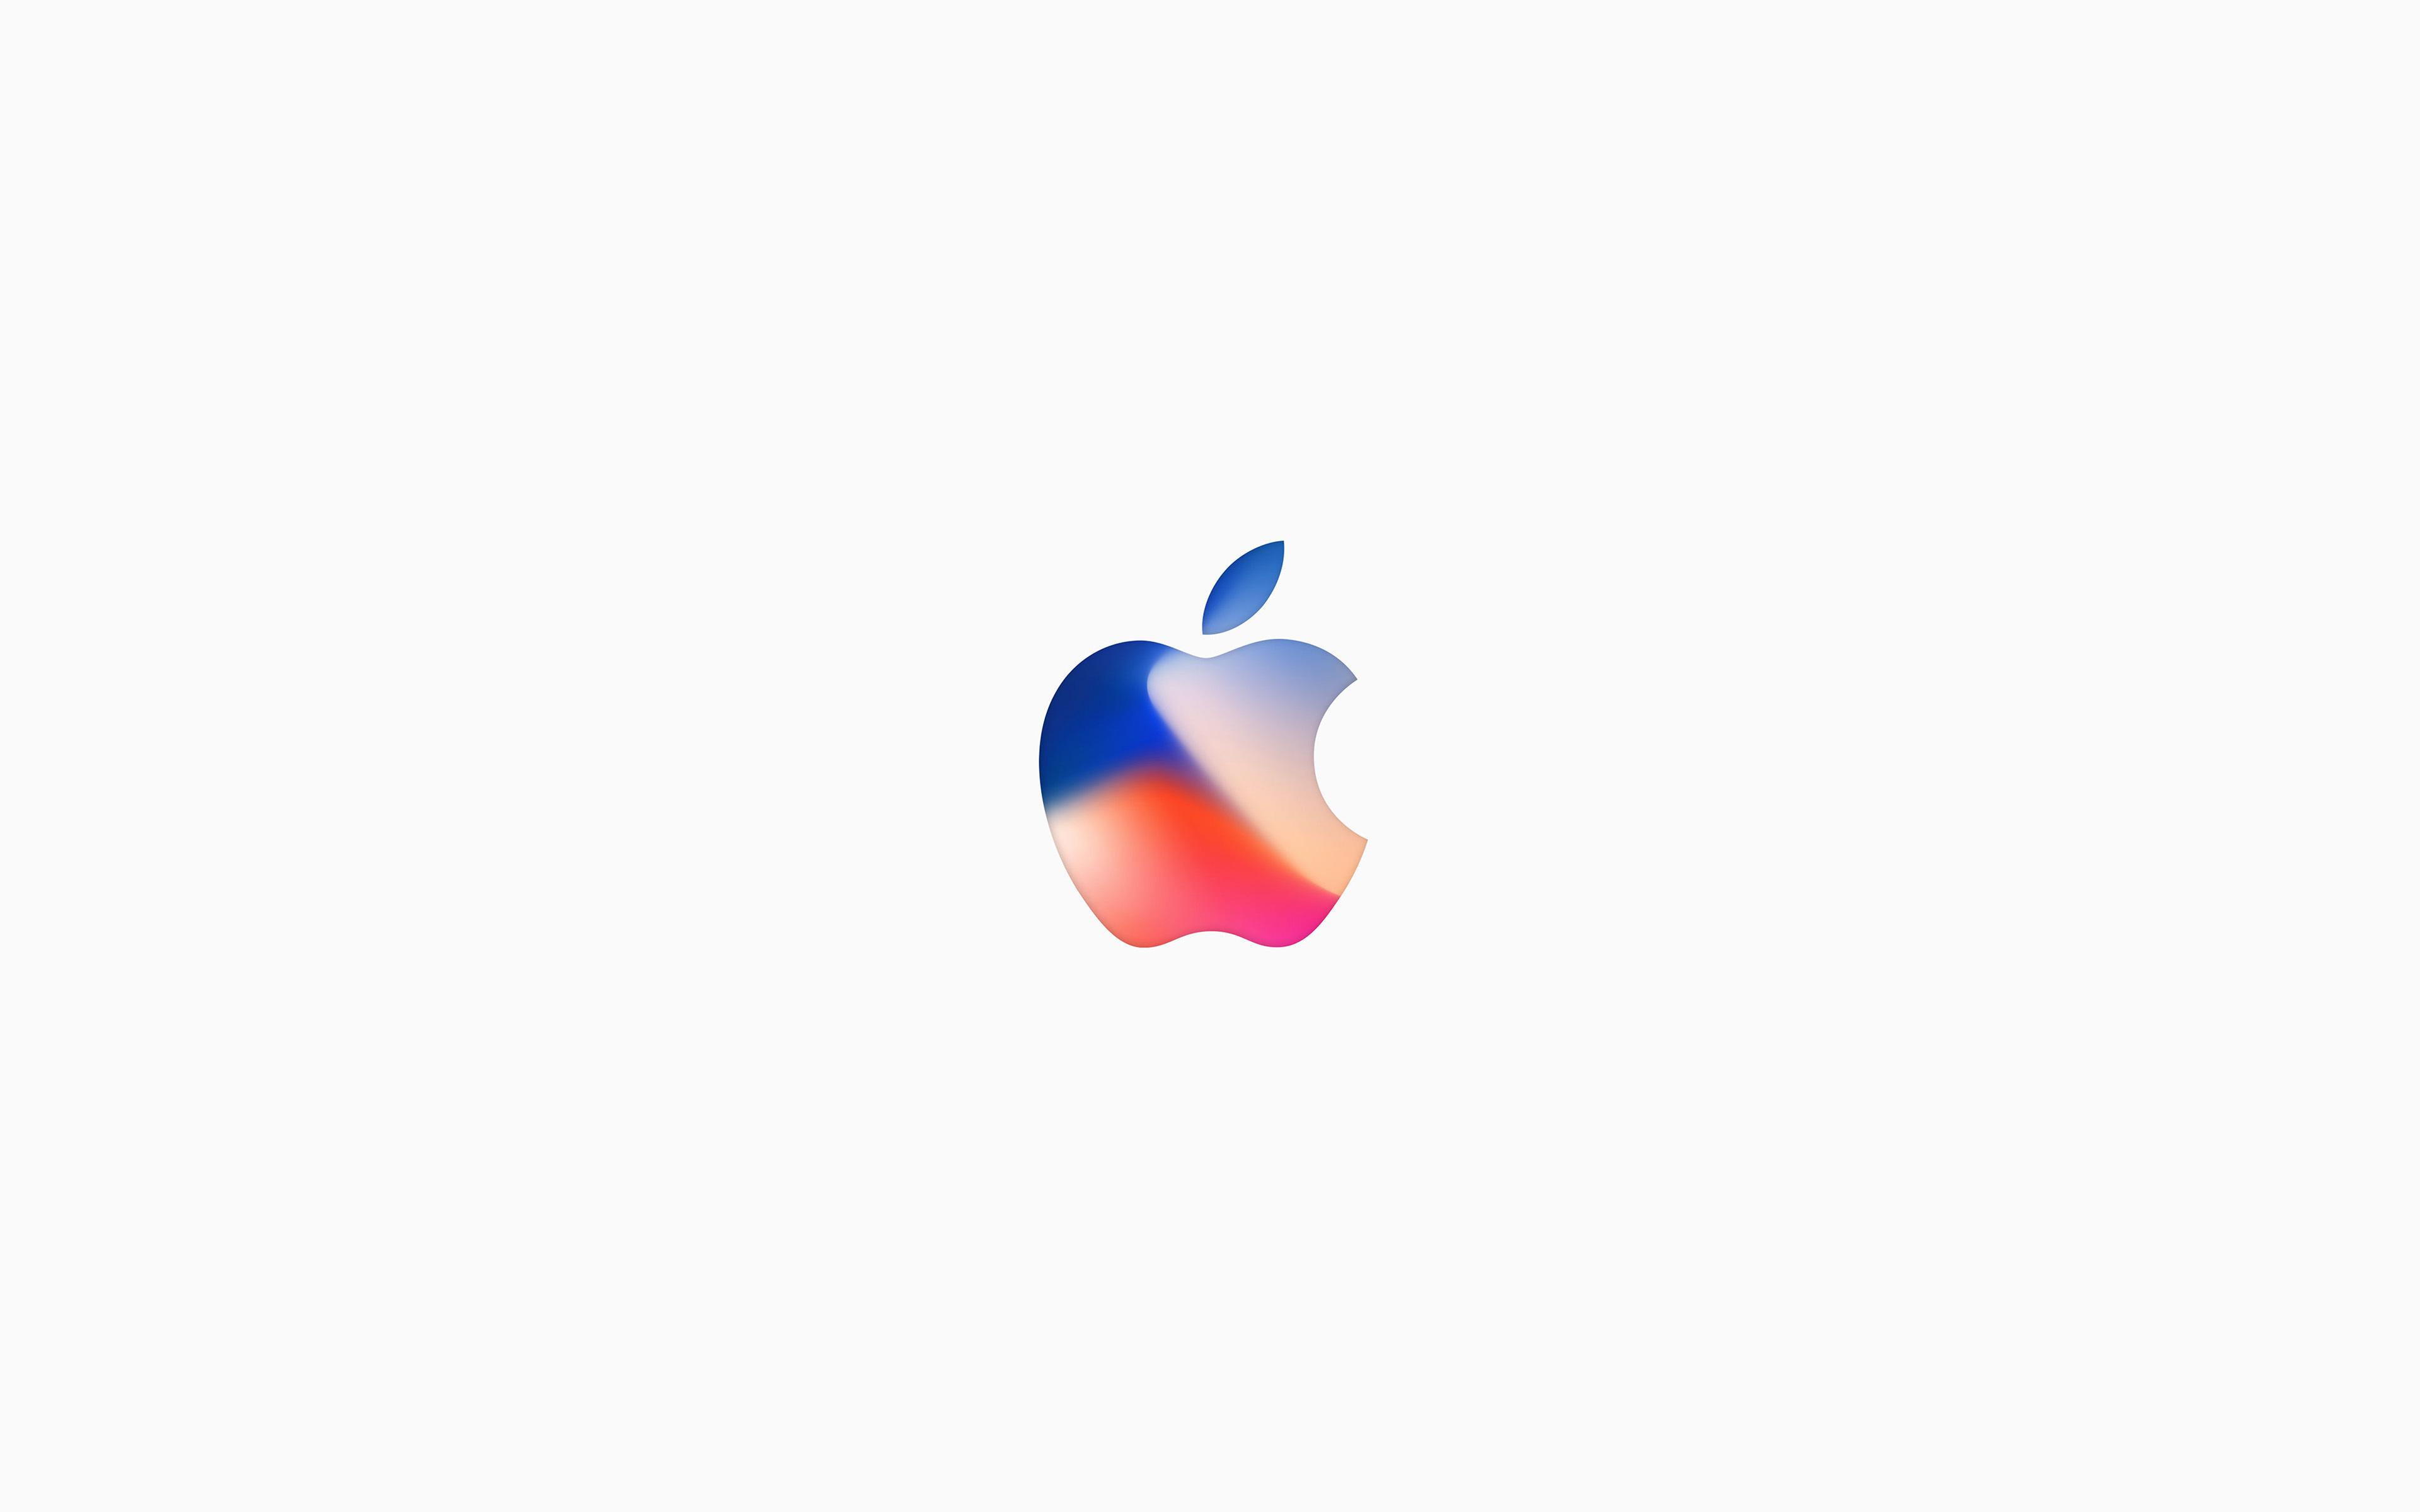 Iphone X Wallpaper 4k Apple Logo